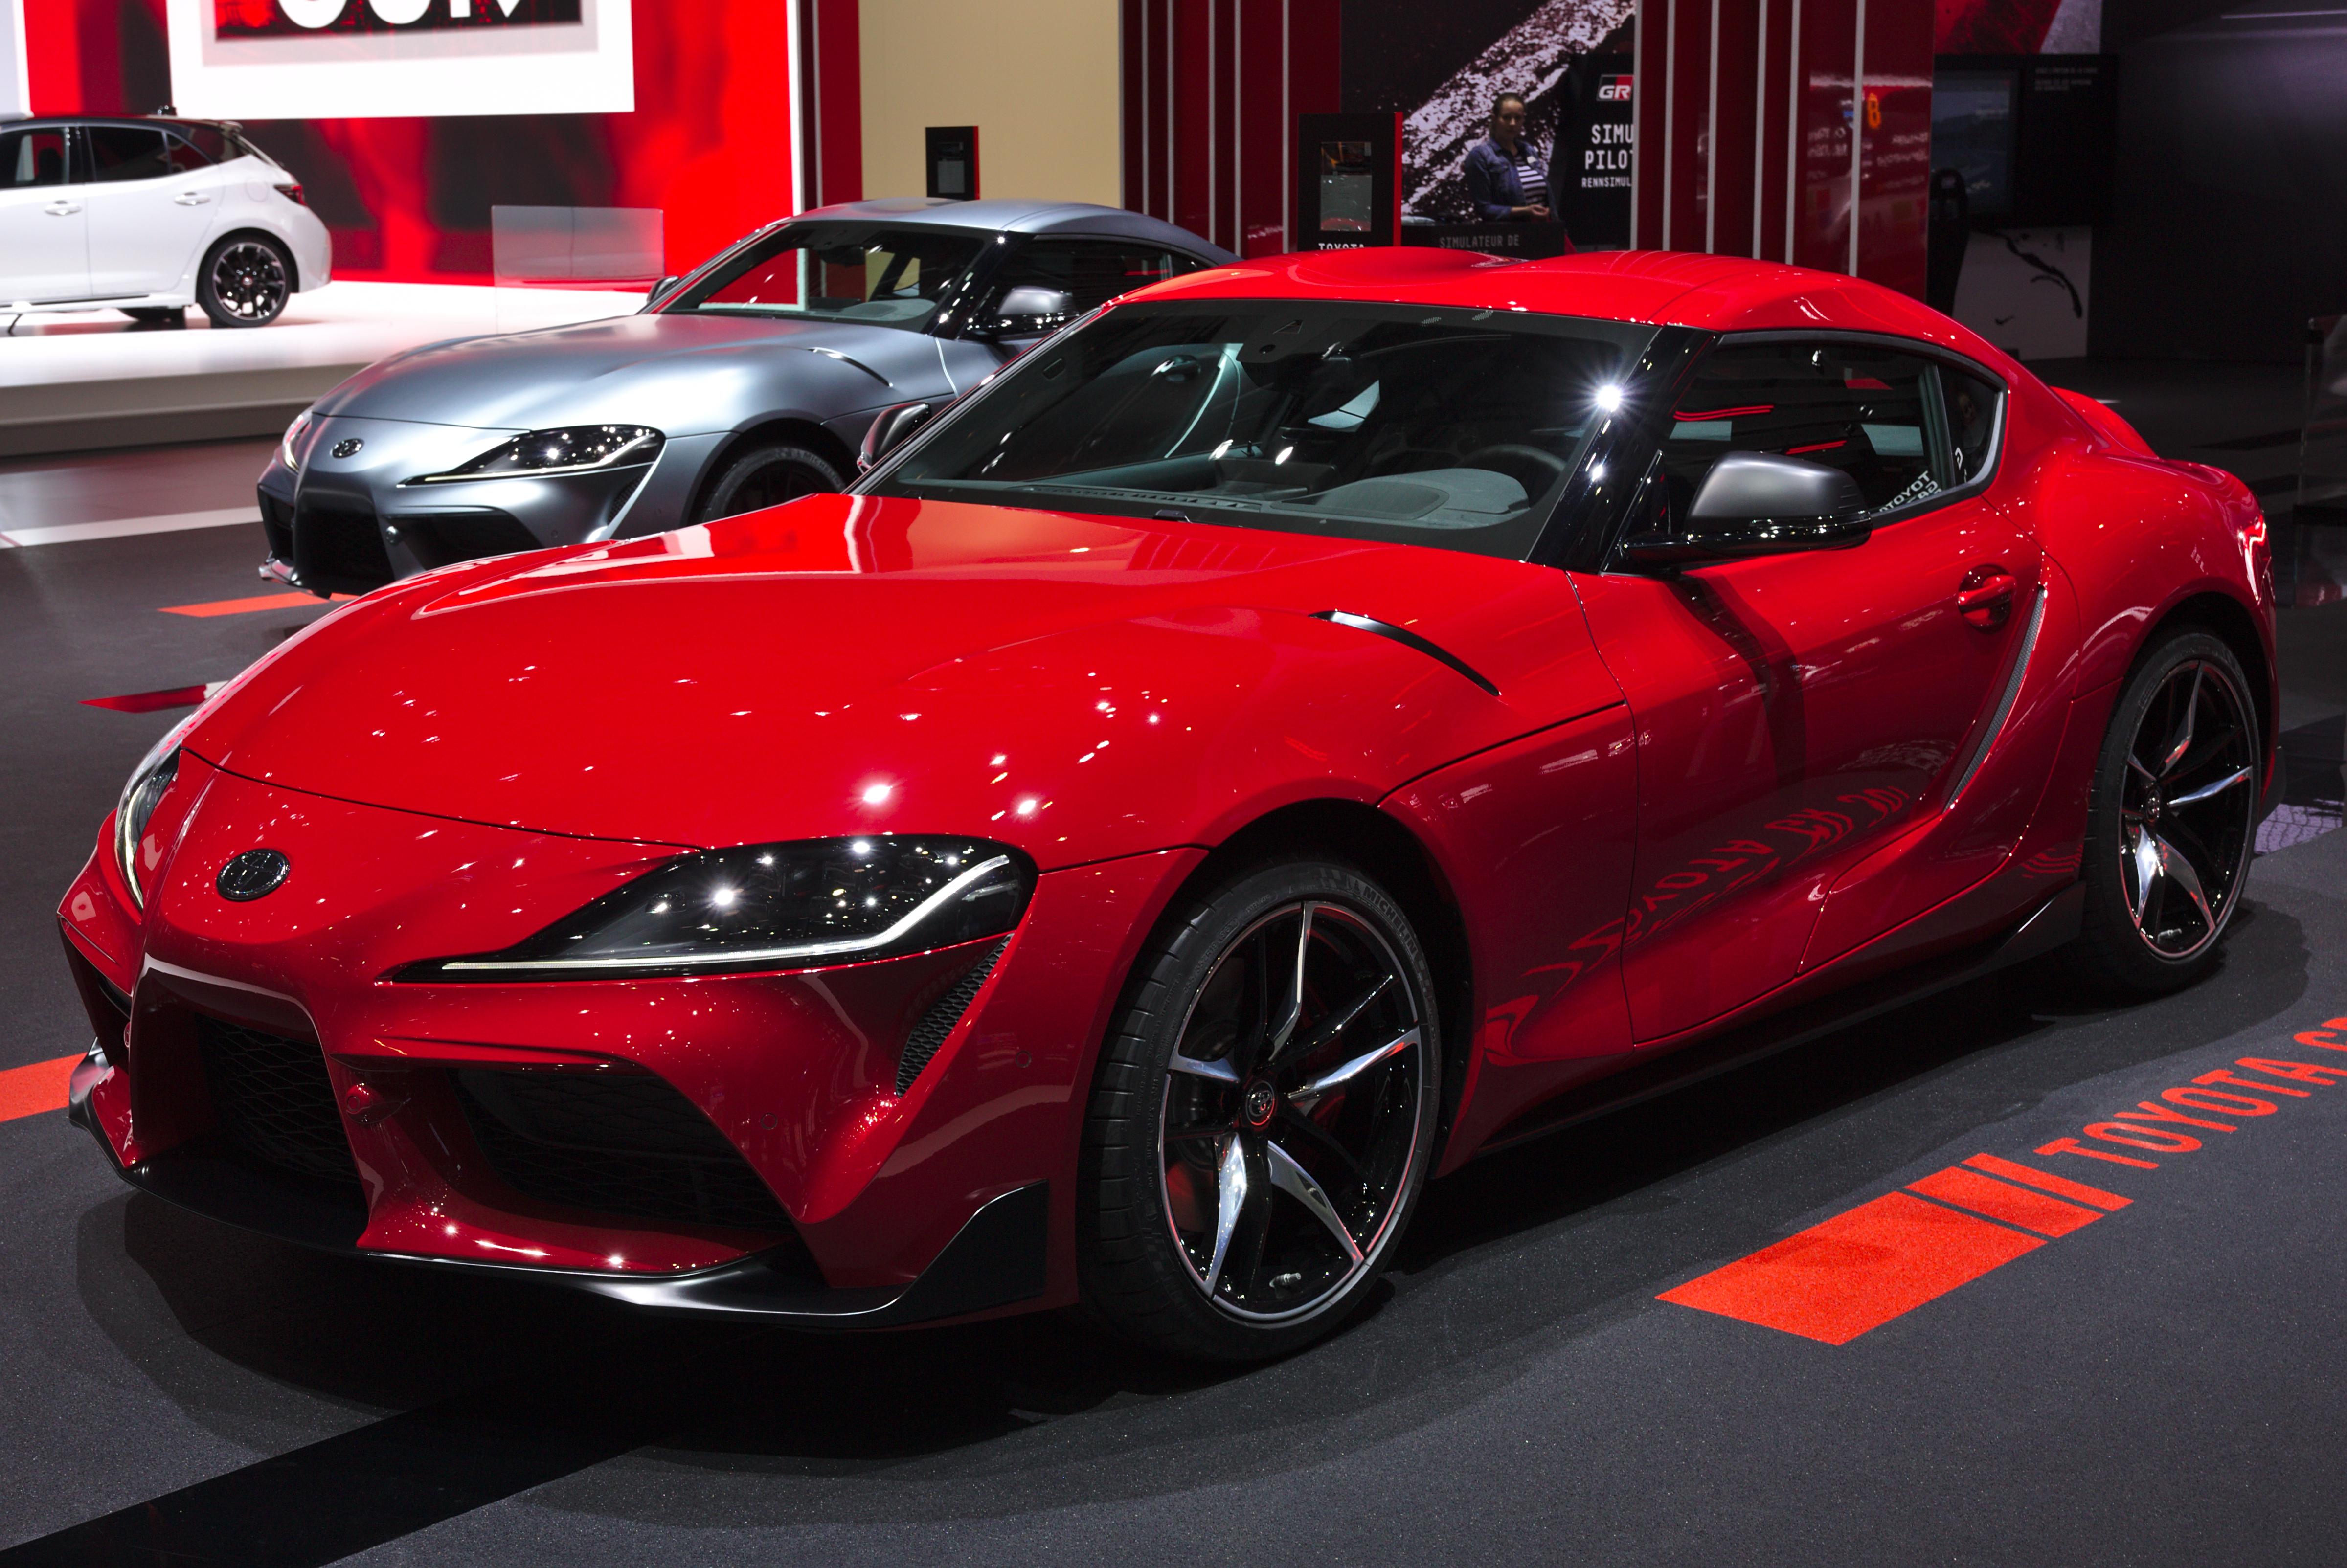 Kelebihan Kekurangan Toyota Su Harga